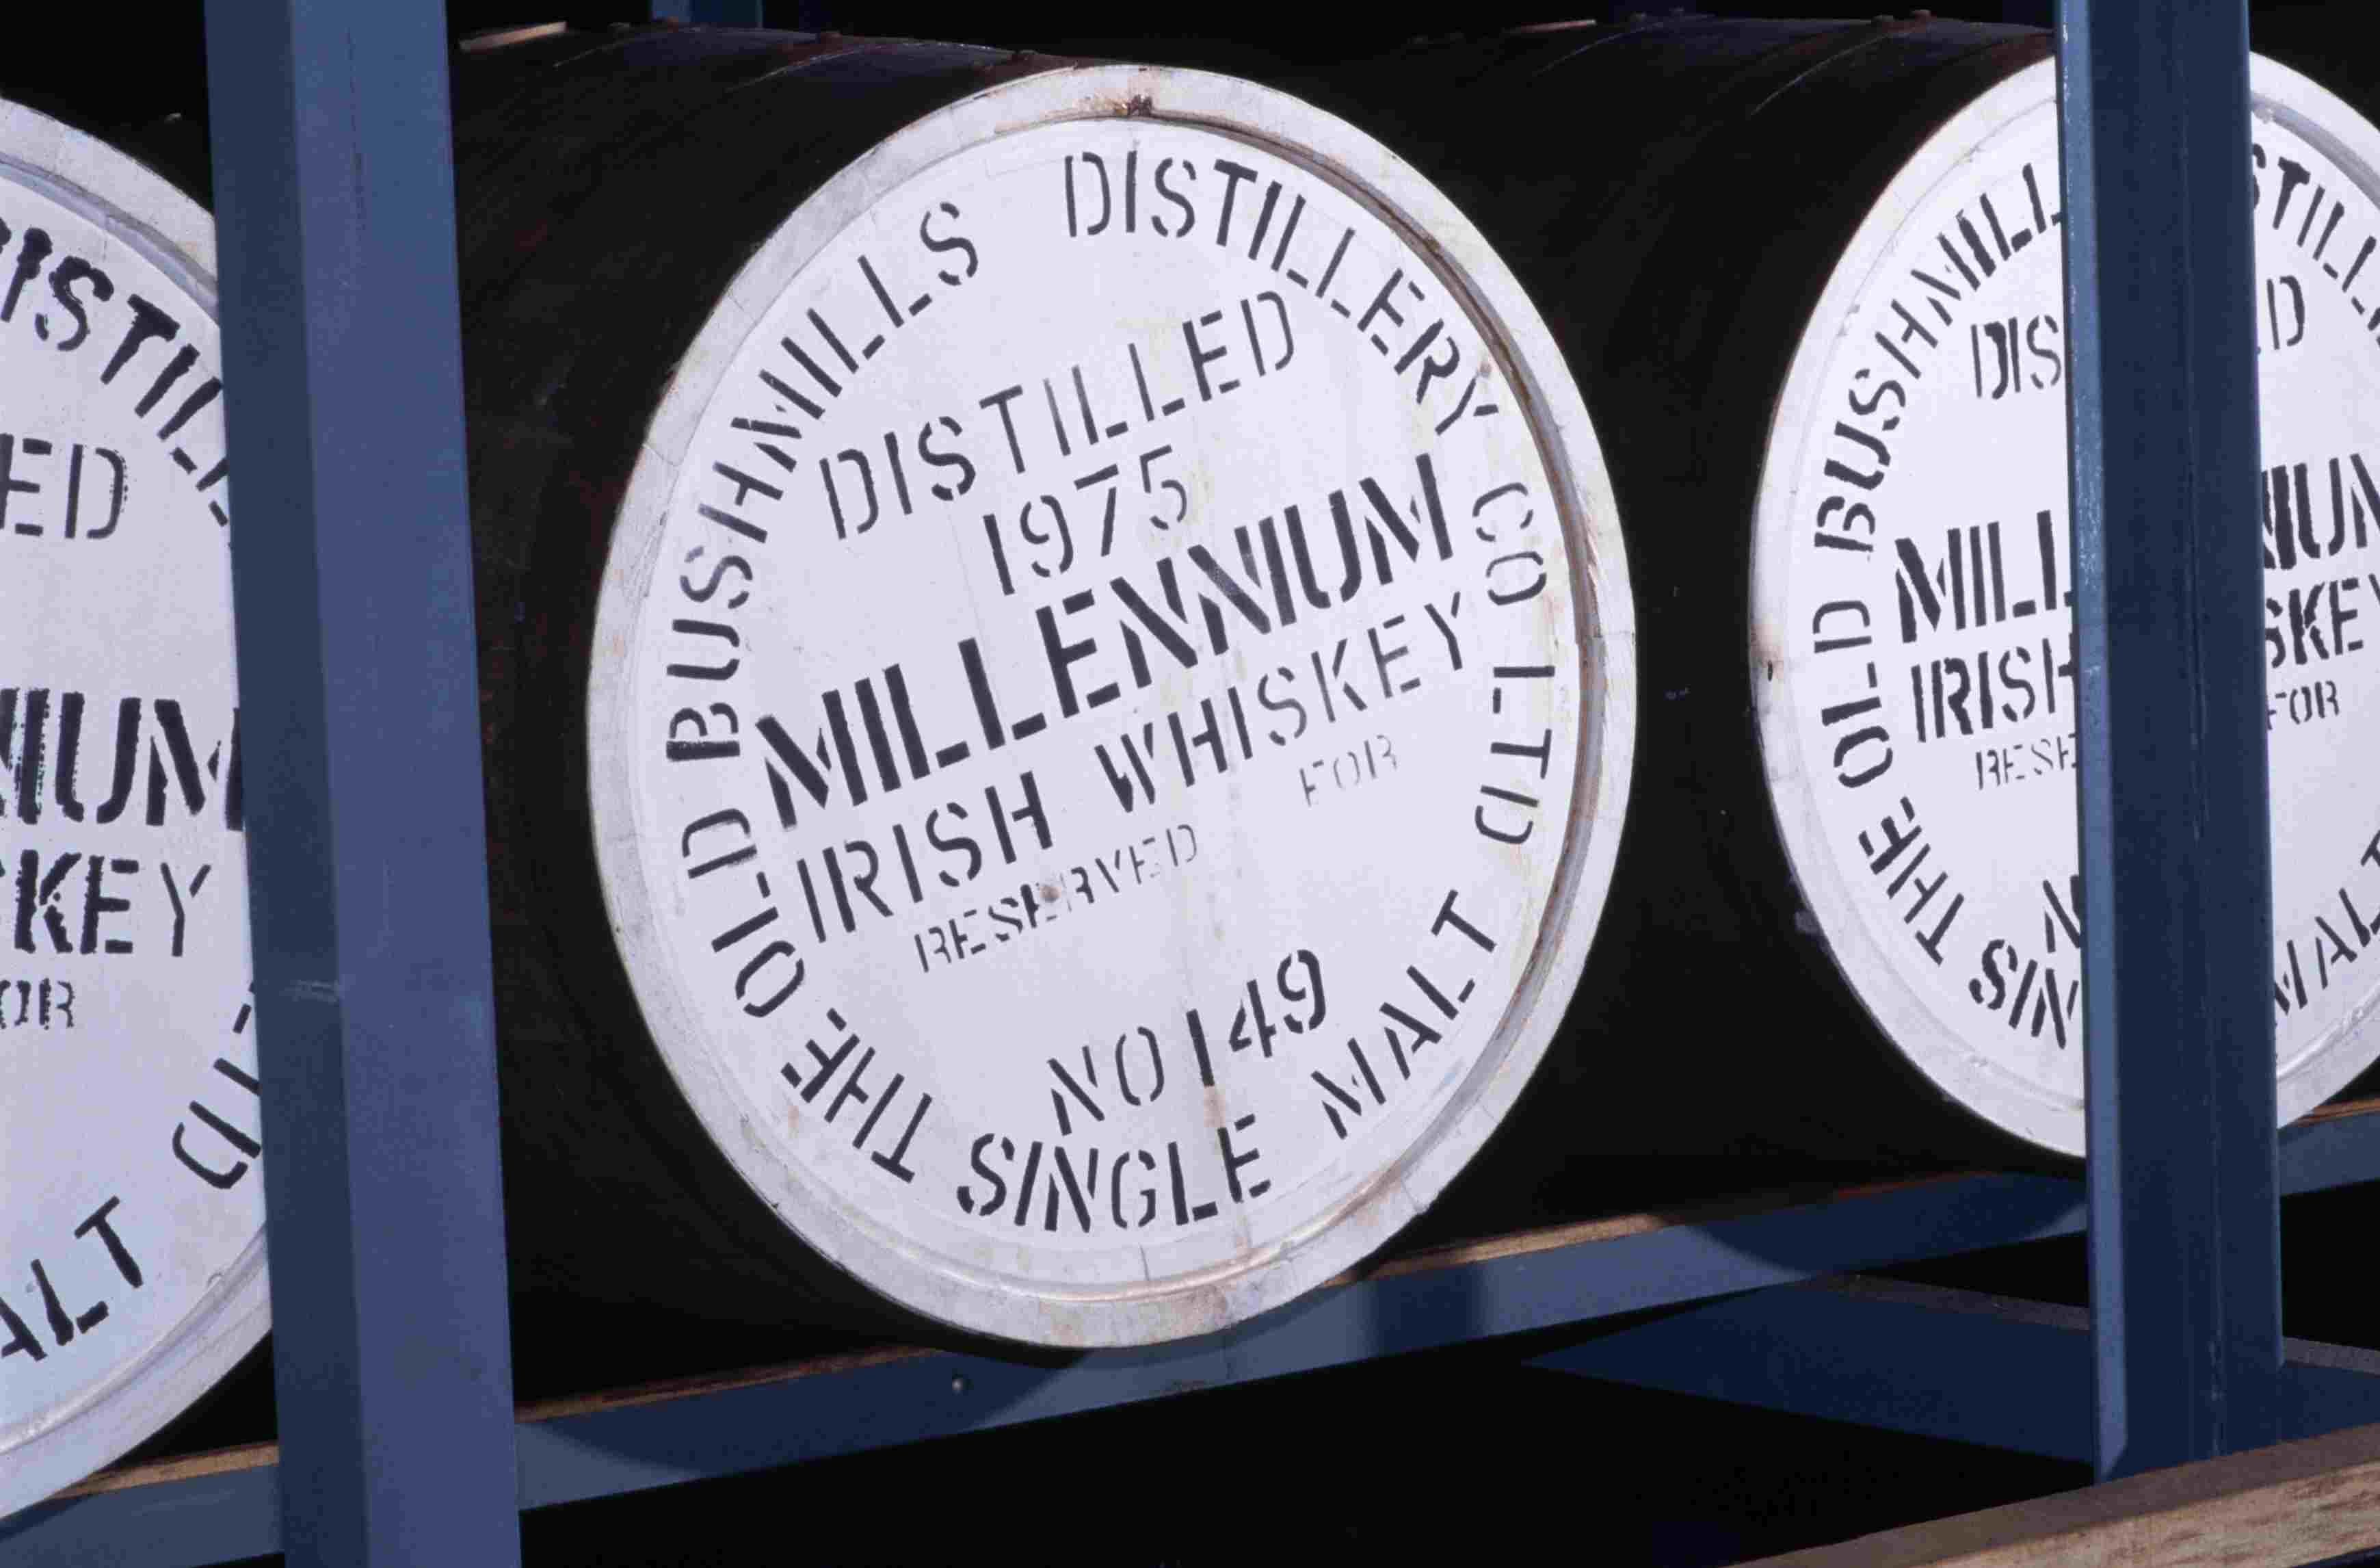 Bushmills Distillery - Barrels of Single Malt Irish Whiskey